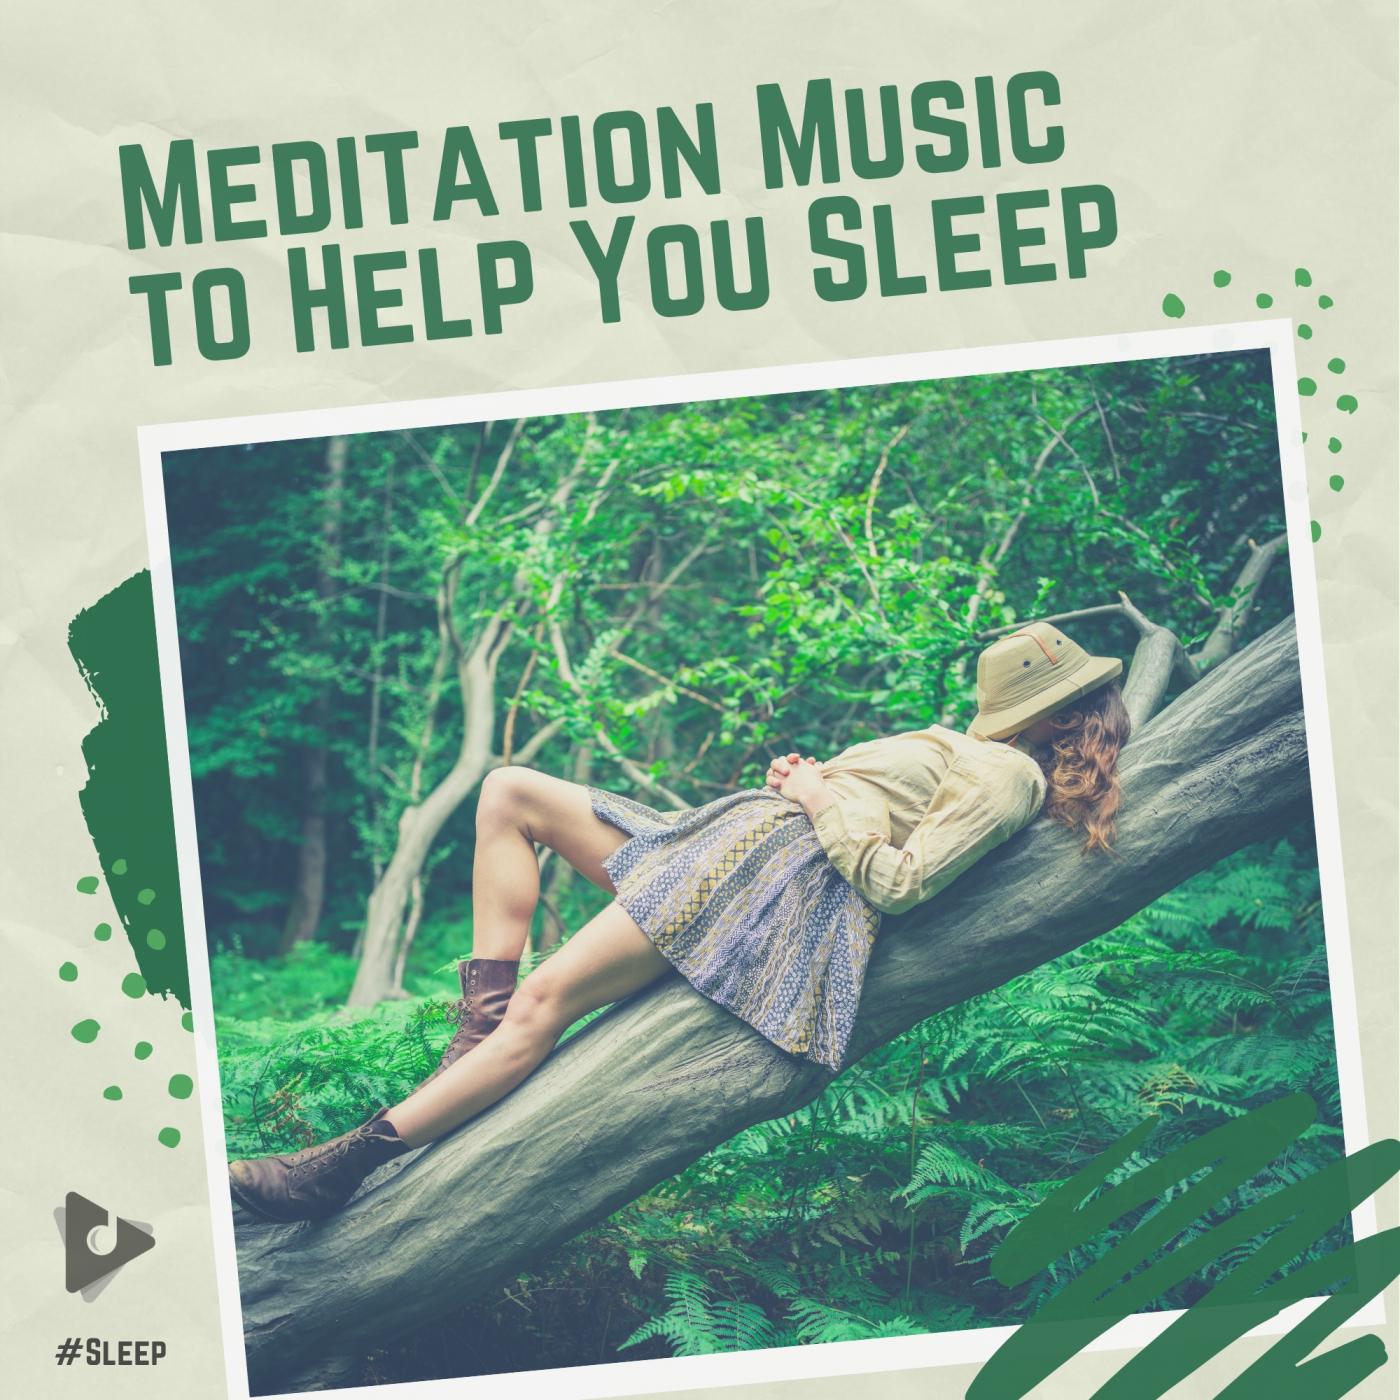 Meditation Music to Help You Sleep